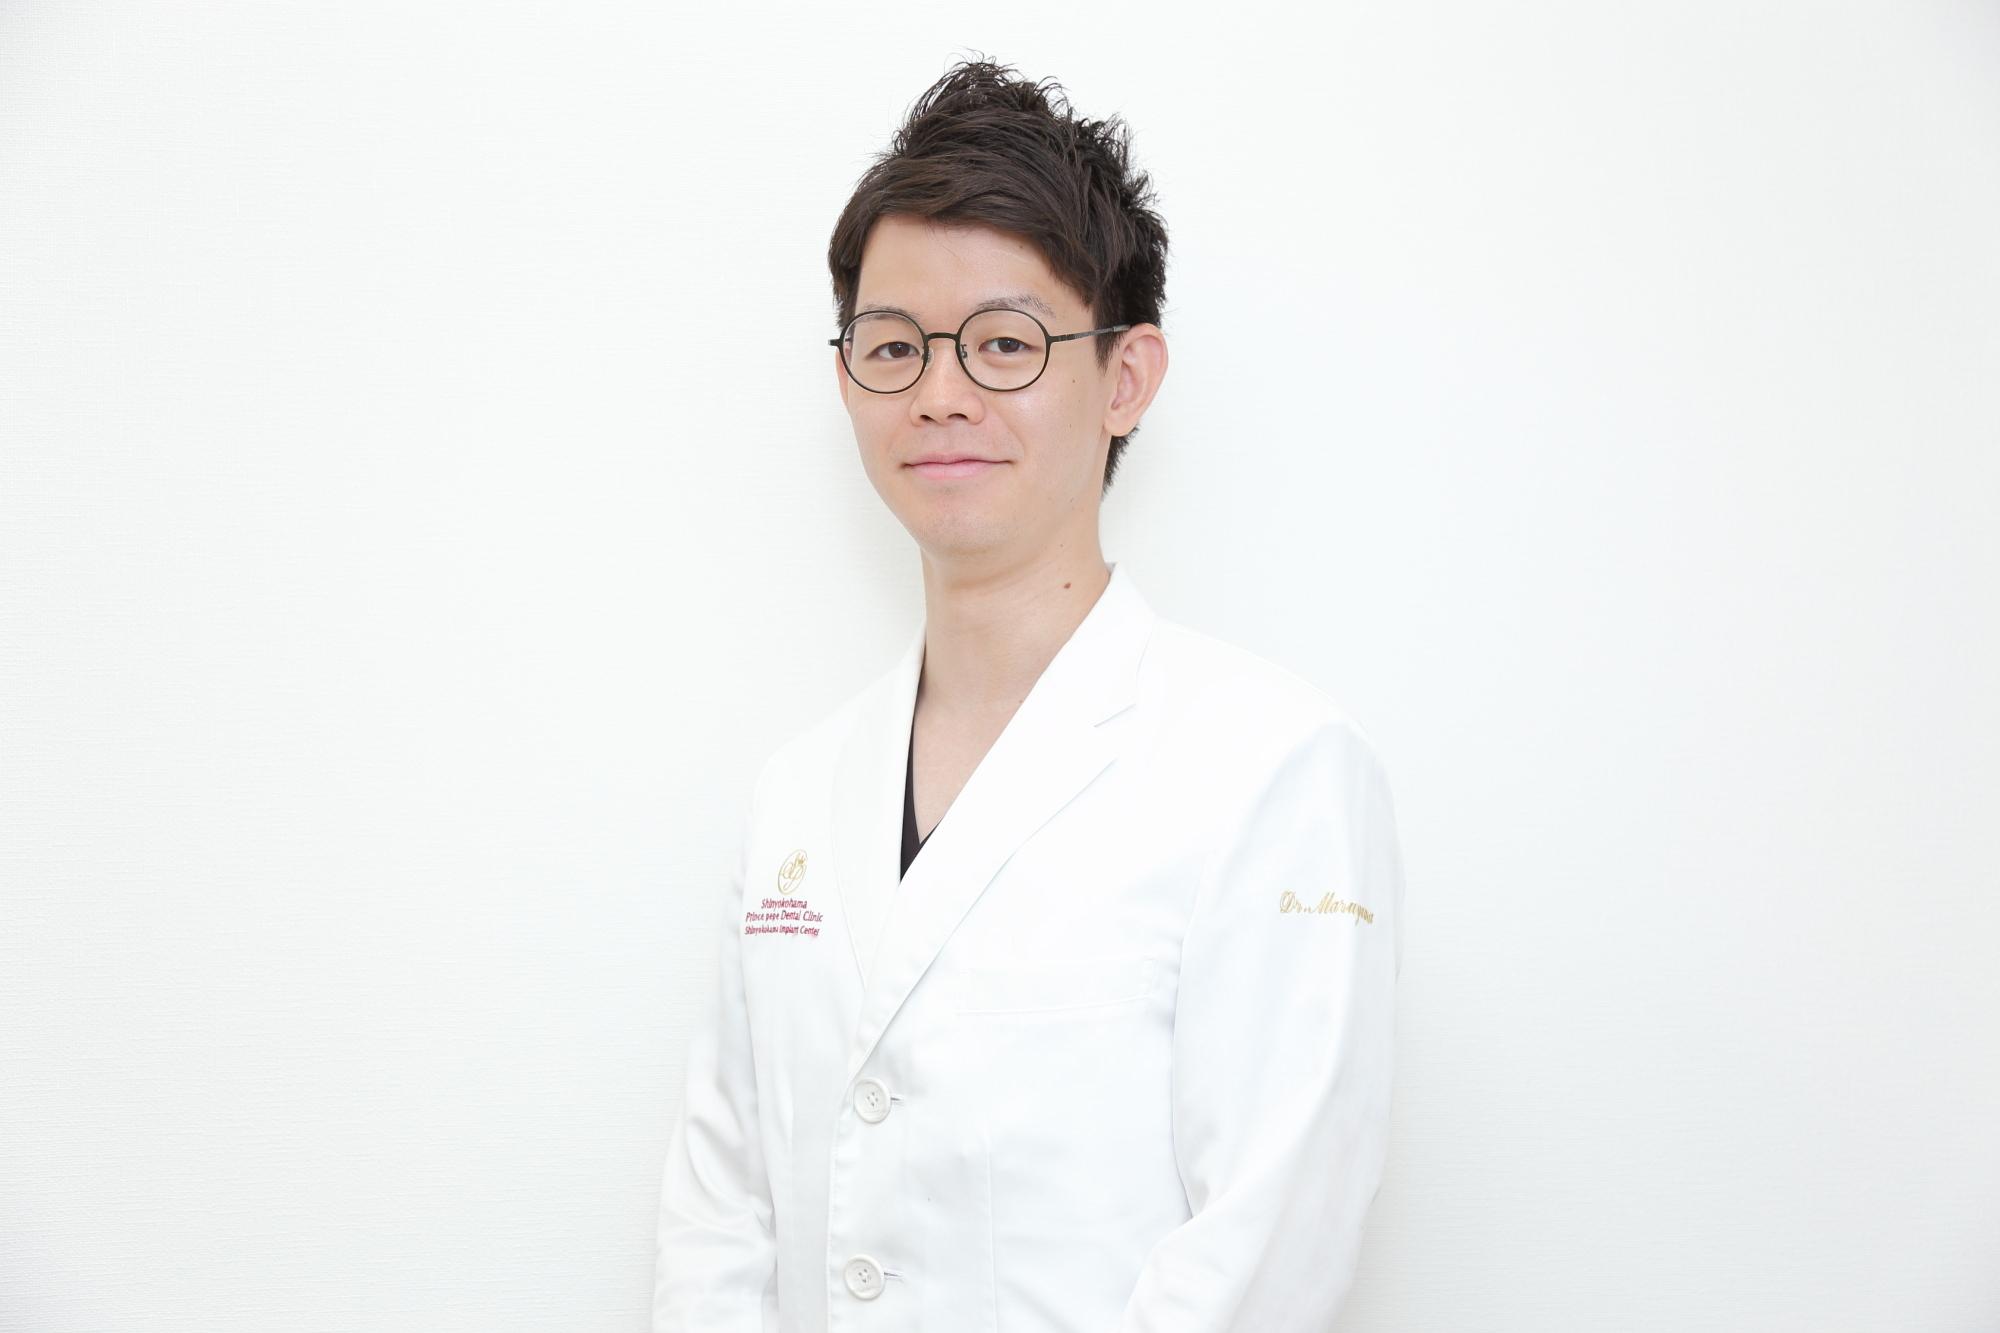 津川晶紀AkinoriTsugawa